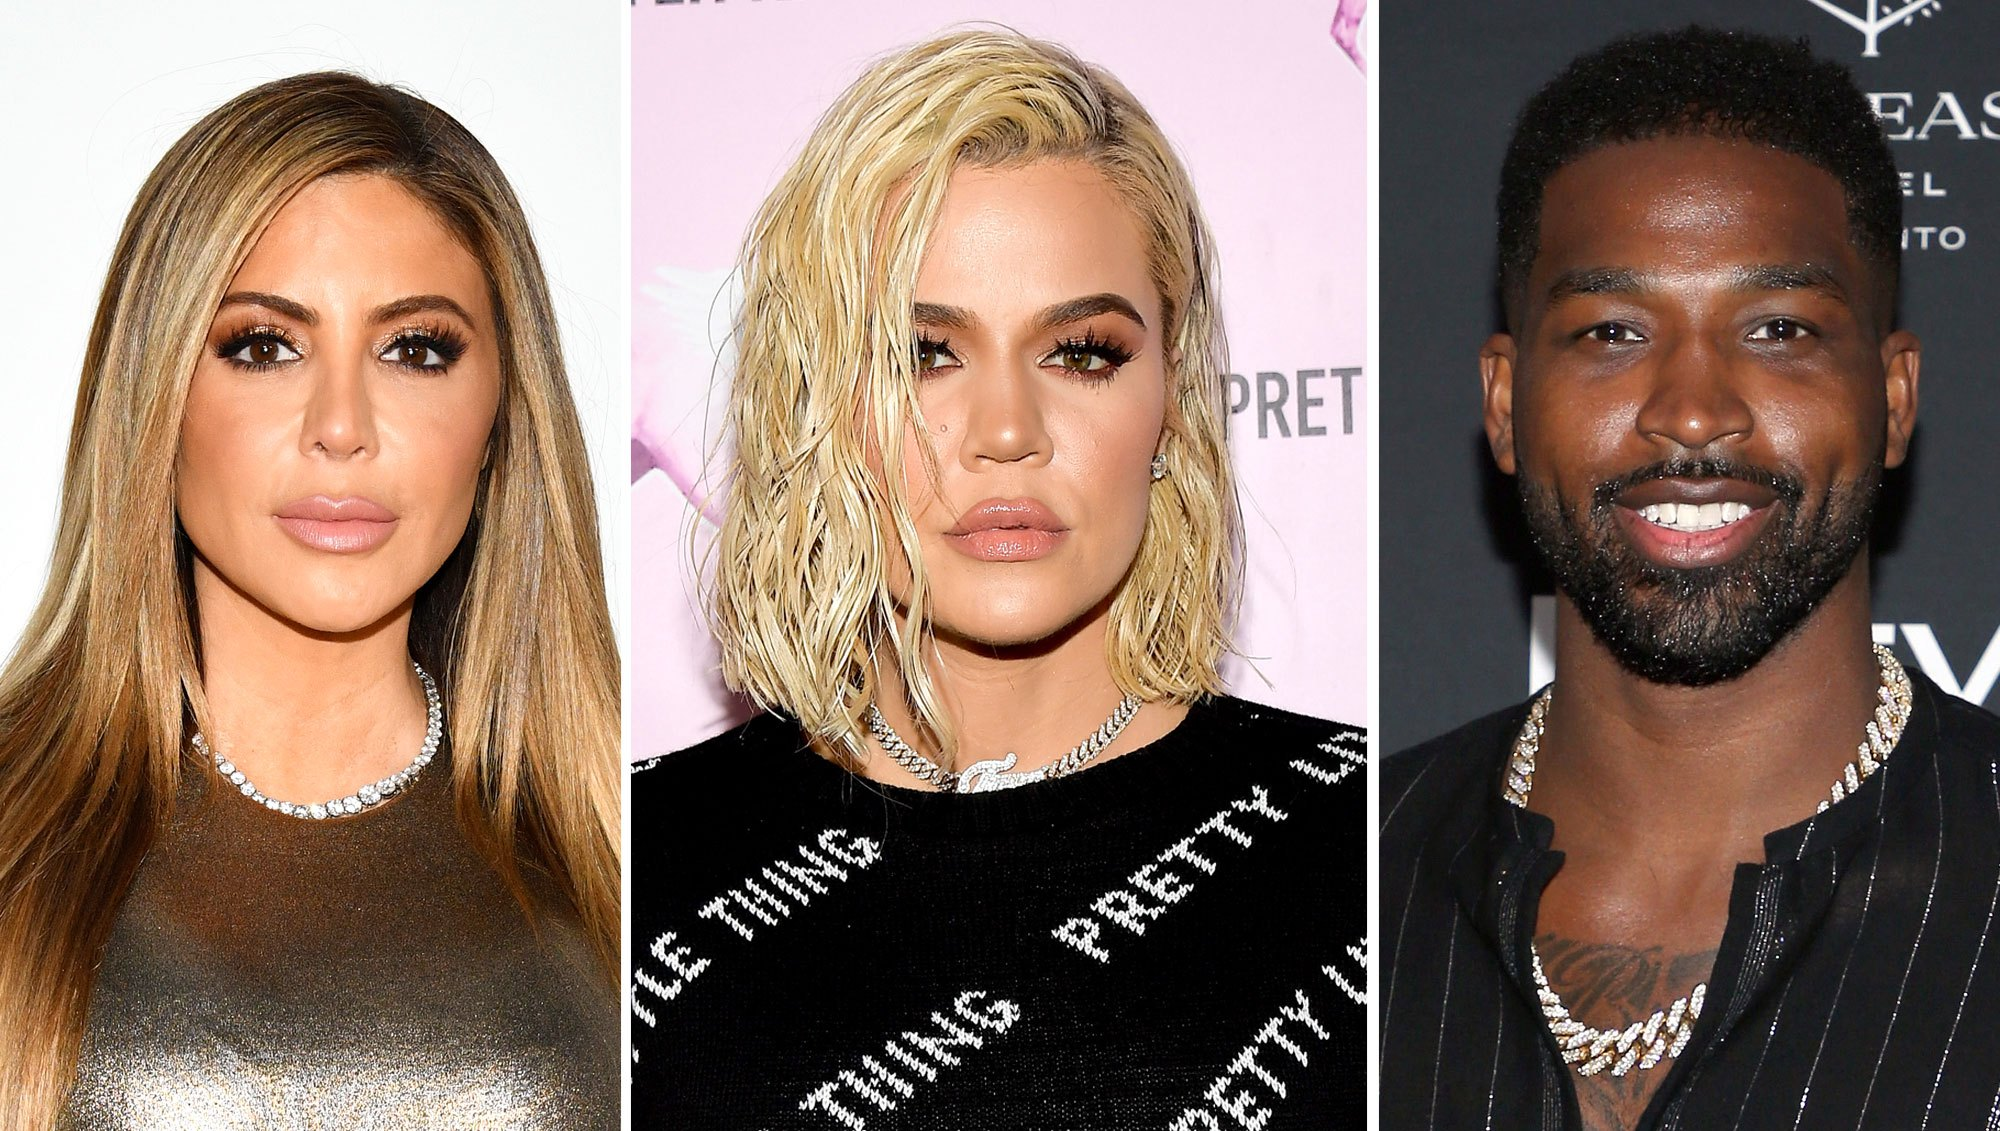 Larsa Pippen Says Khloe Kardashian Is Doing 'Good' After Tristan Thompson Drama